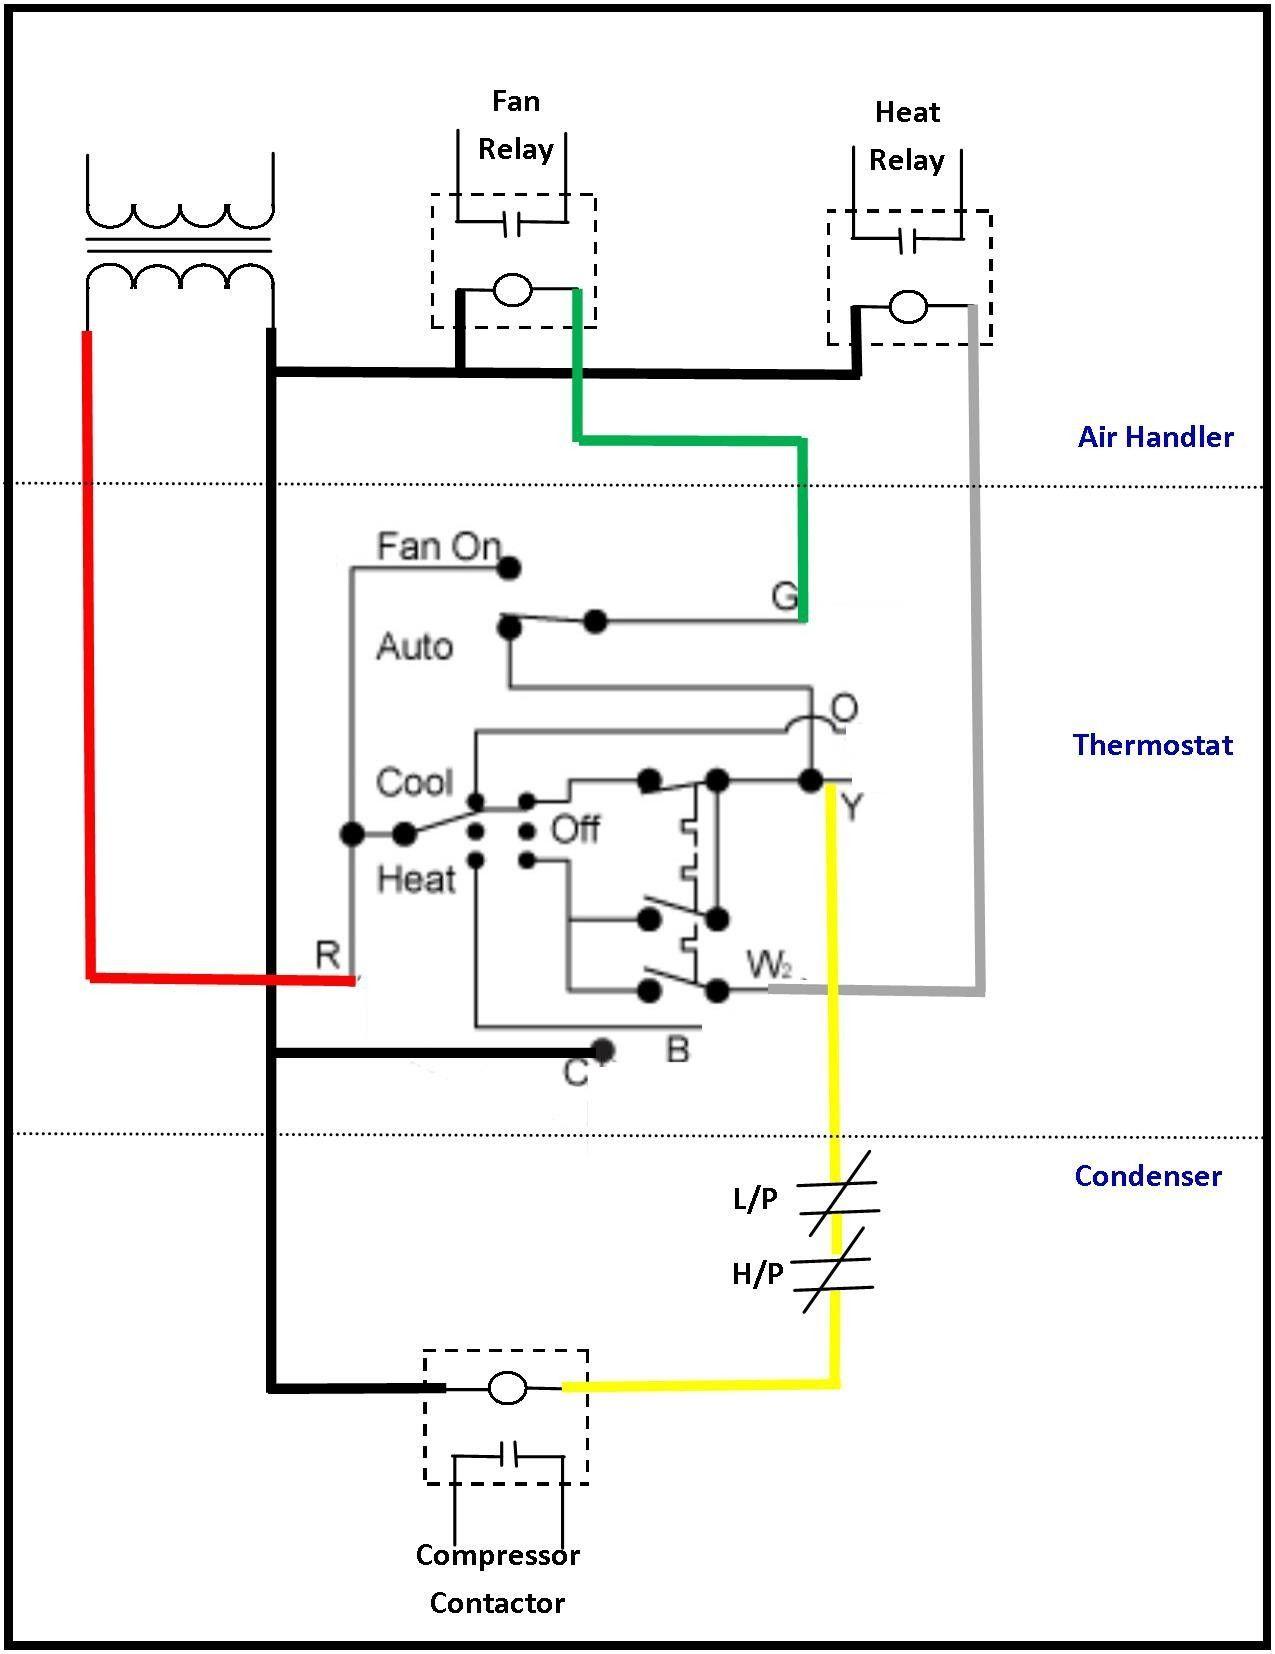 50 Luxury 90340 Relay Wiring Diagram | Thermostat wiring, Electrical  circuit diagram, Electrical wiring diagram | Hvac Fuse Wiring Diagram |  | Pinterest